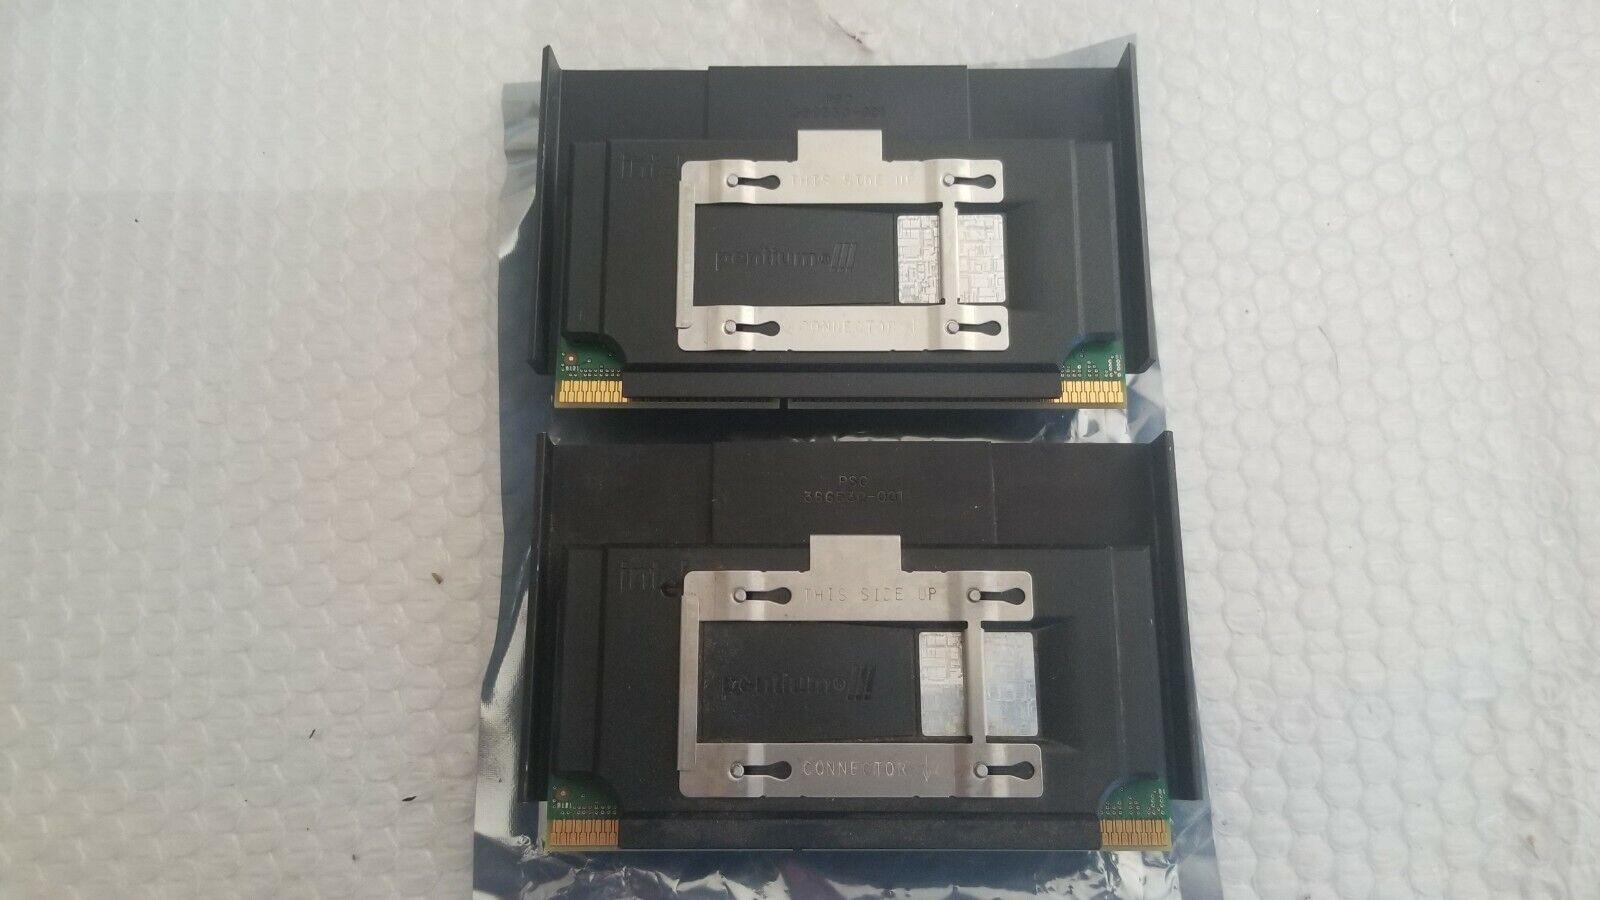 Matching Pair - Intel Pentium III 500Mhz Slot 1 Processors 500/512/100/2.0V - $9.95